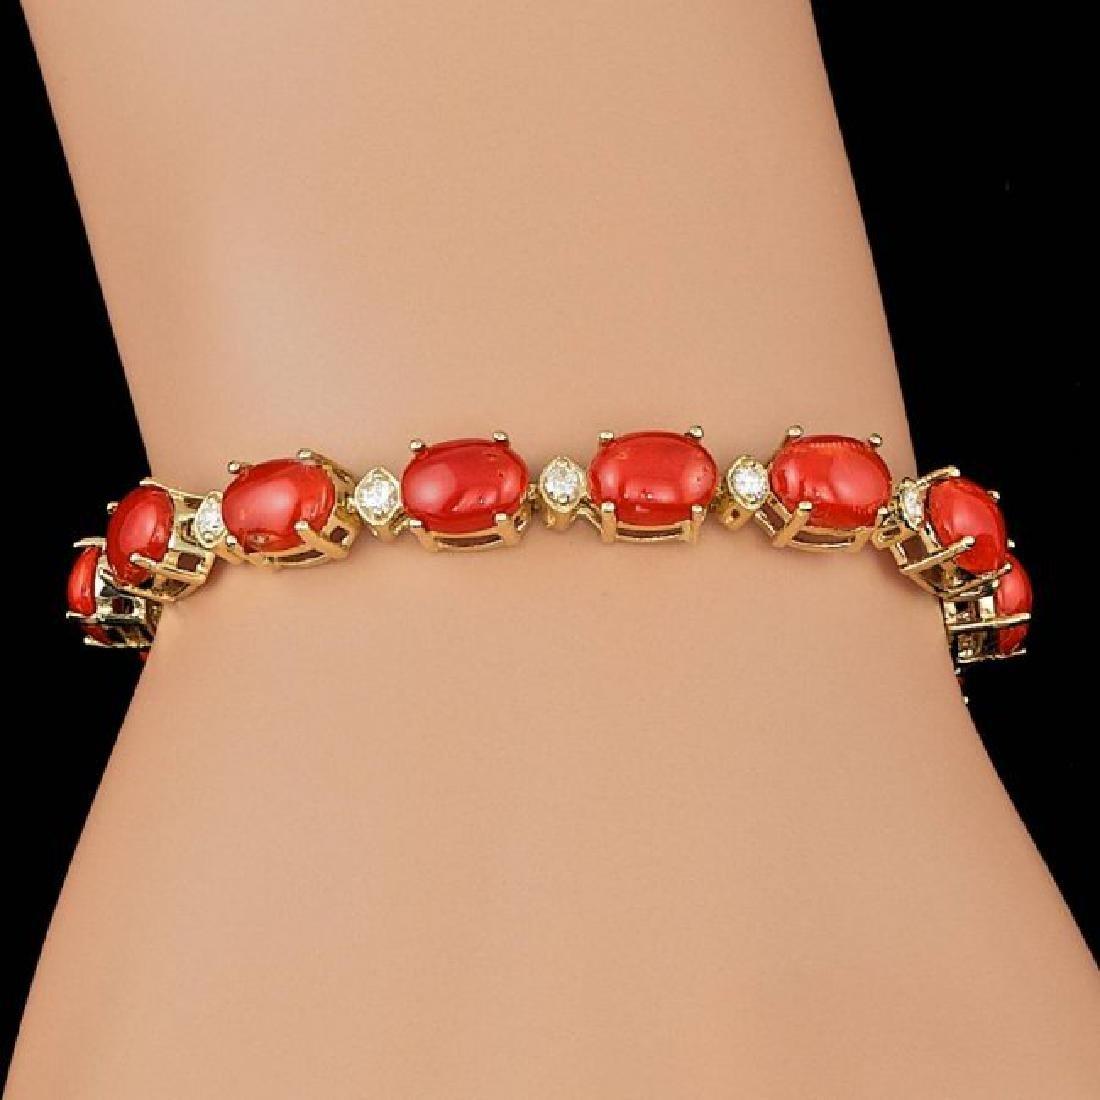 14k Gold 15.00ct Coral 0.80ct Diamond Bracelet - 4